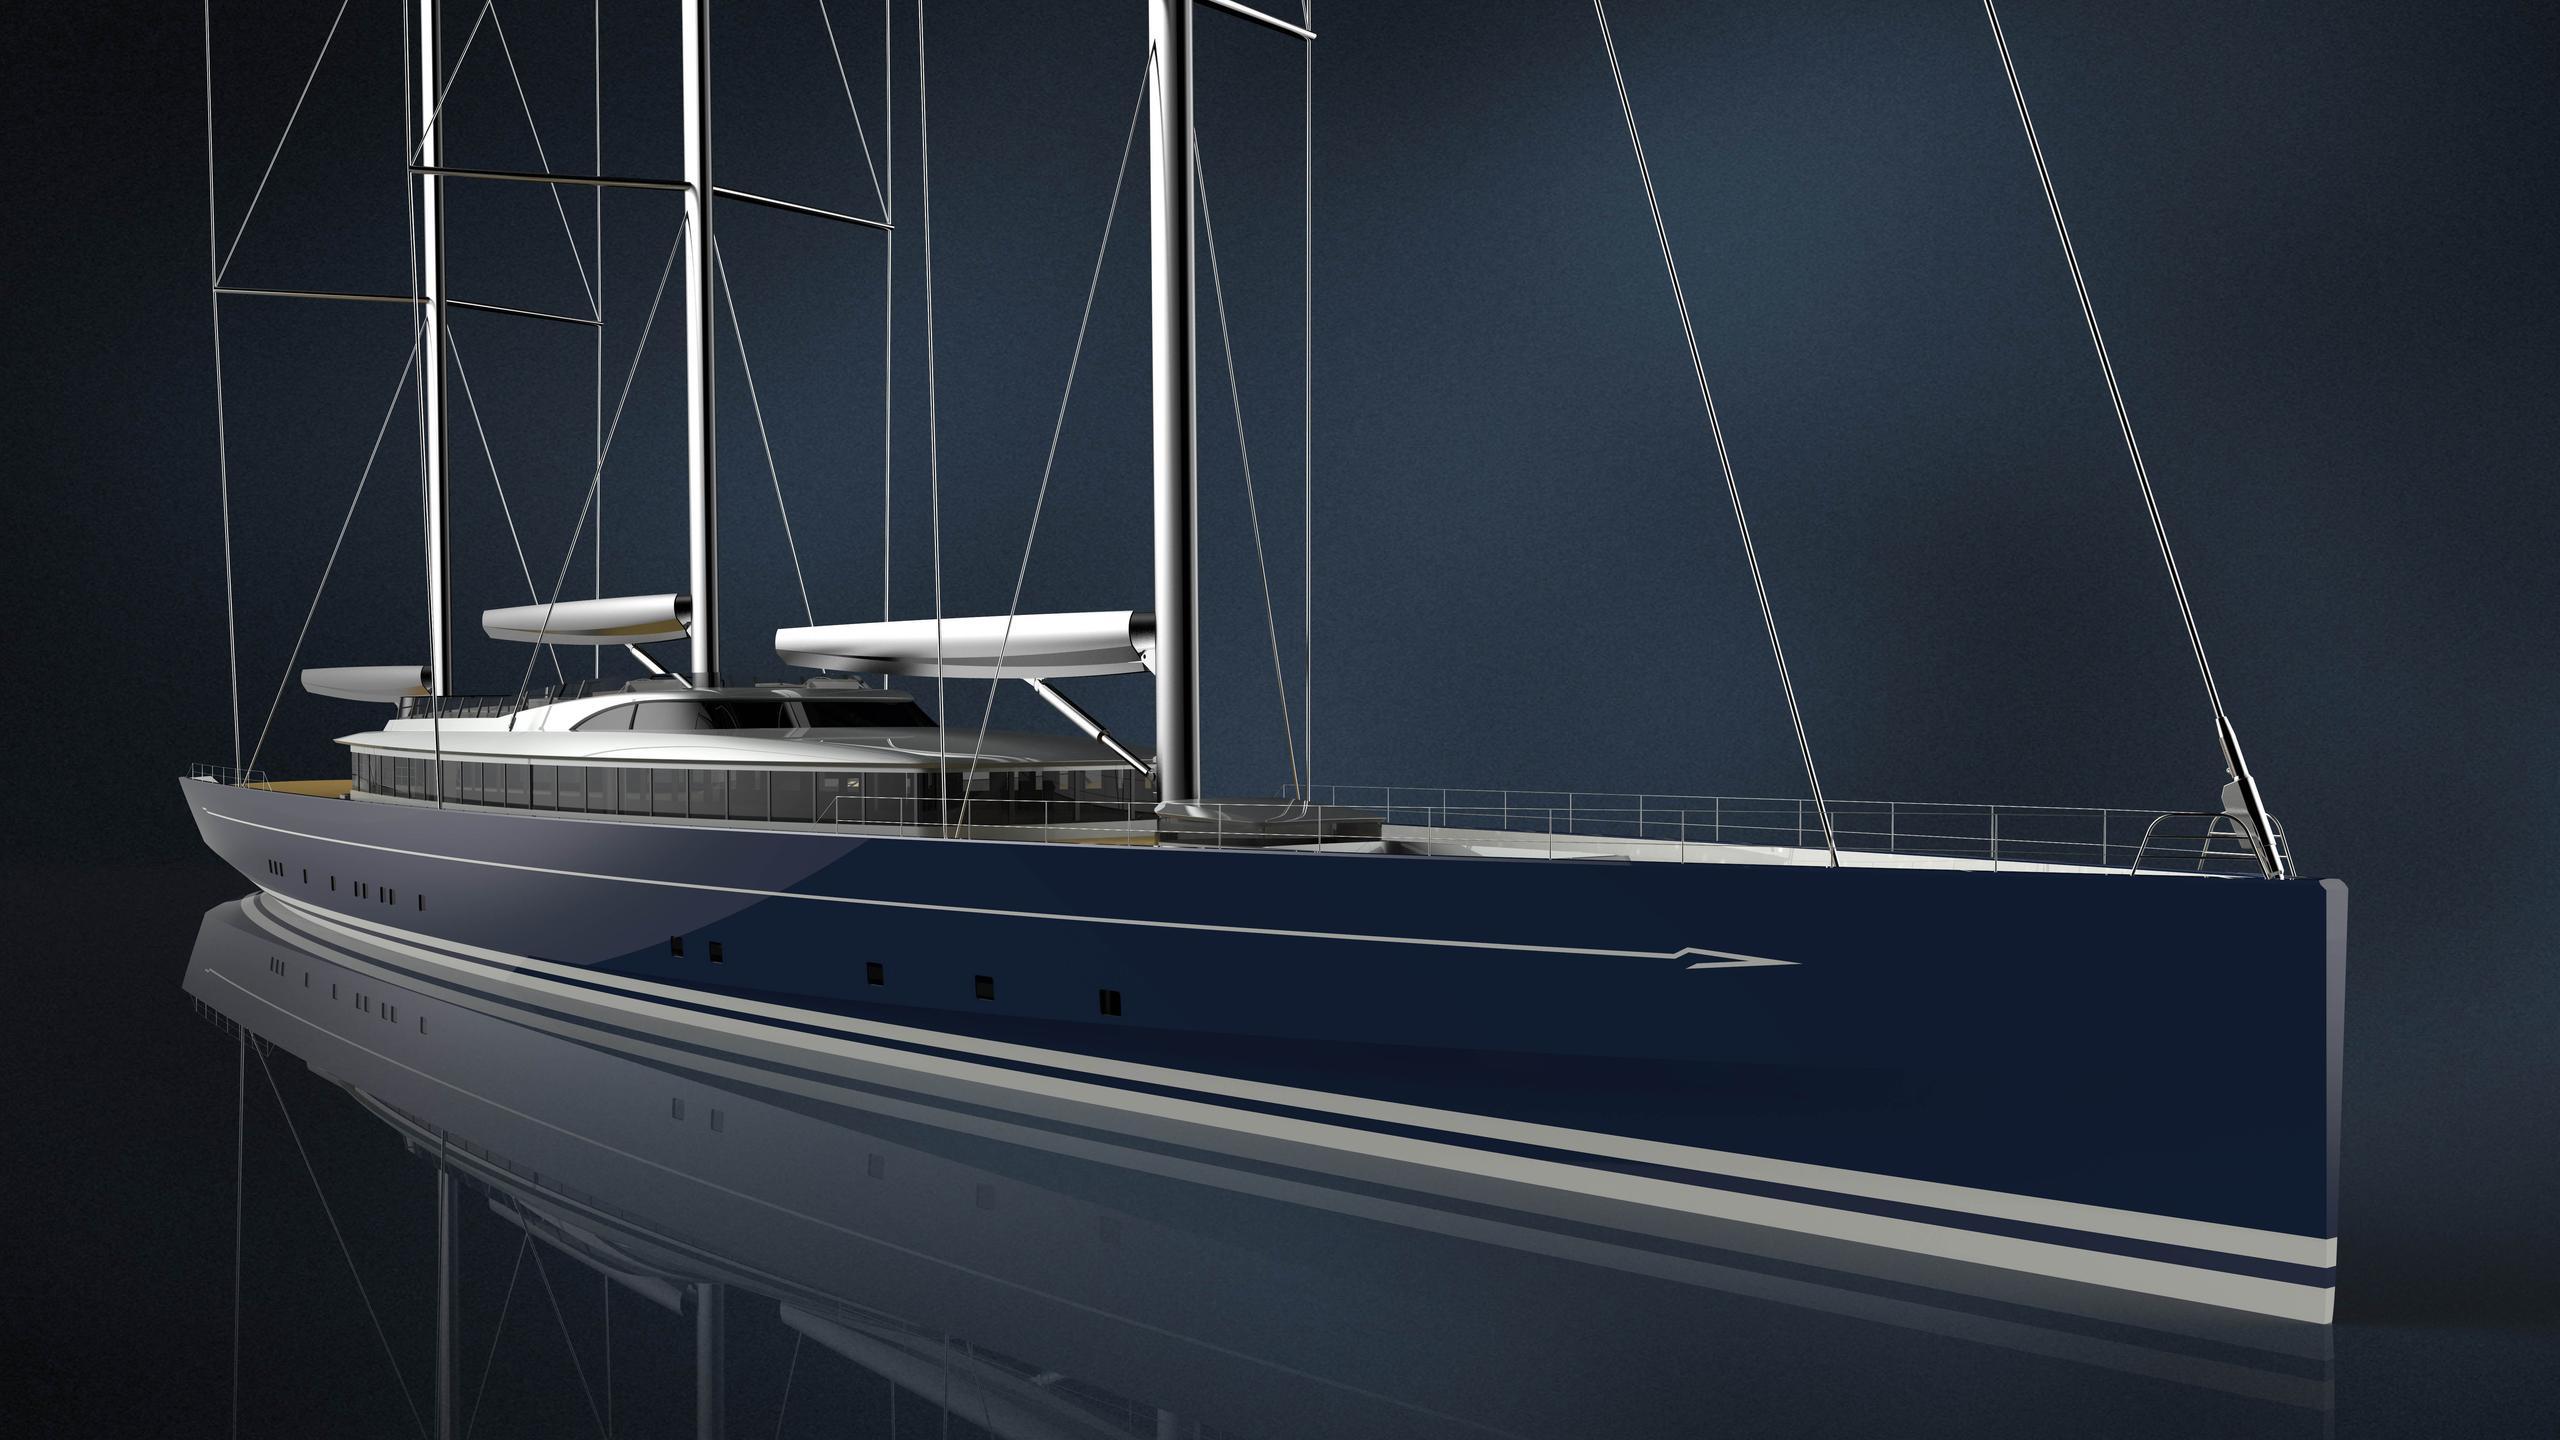 rh400 sailing yacht royal huisman 81m 2020 rendering half profile